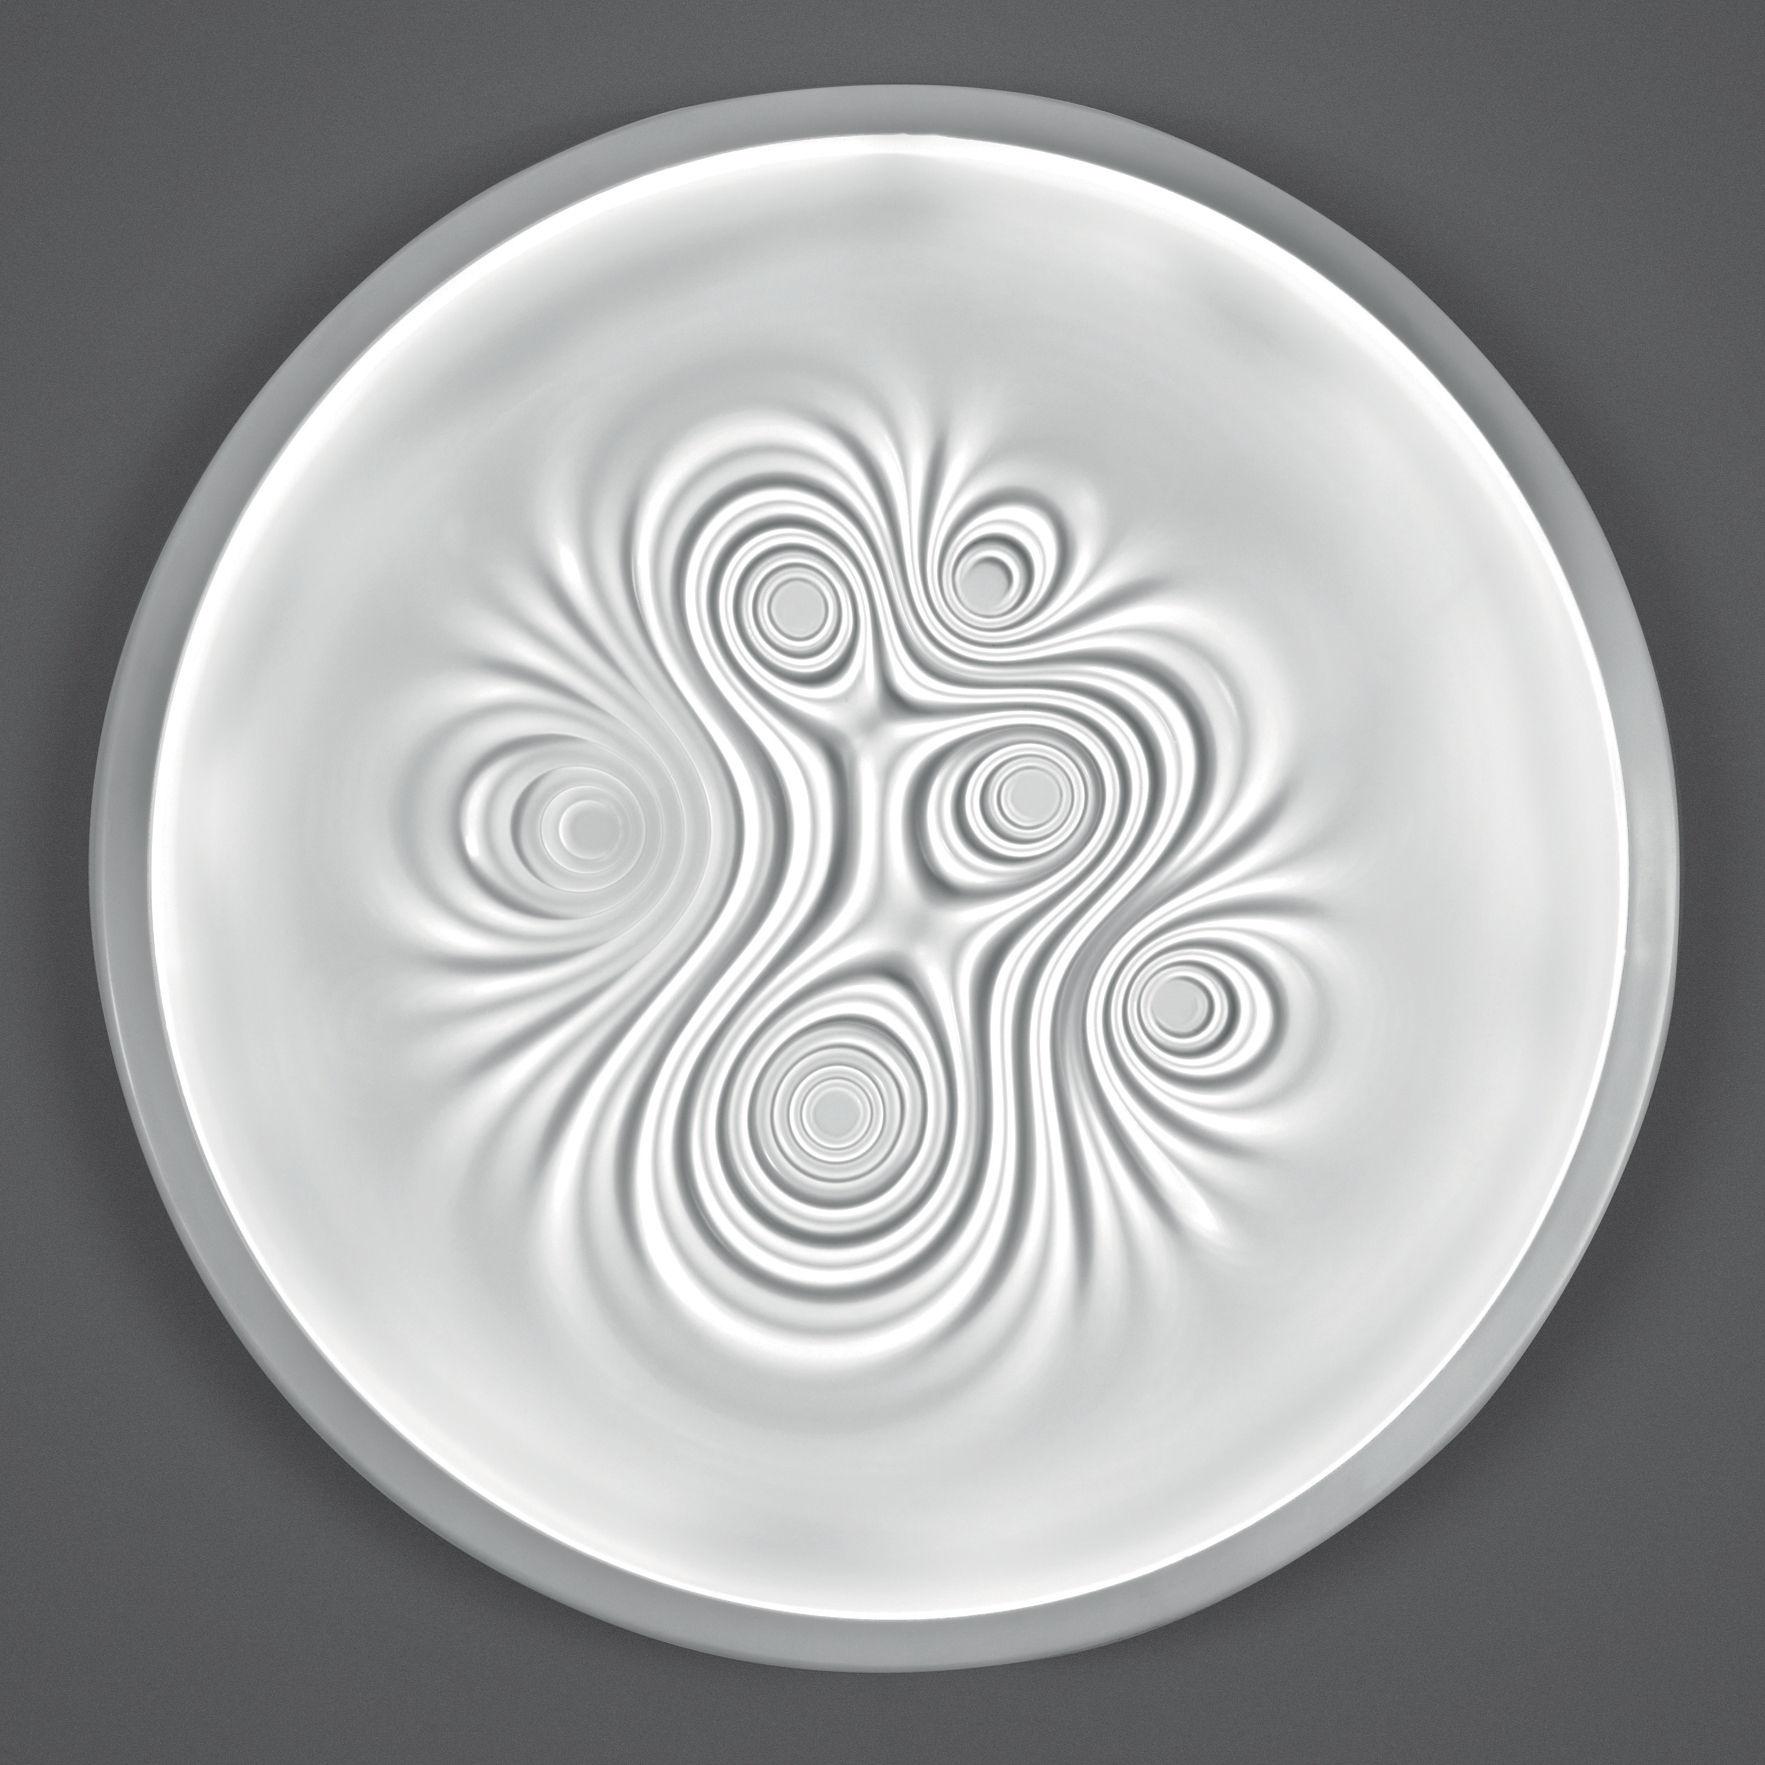 Lighting - Wall Lights - Nebula Wall light - LED / Ceiling lamp - Ø 80 cm by Artemide - White - Aluminium, Opal methacrylate